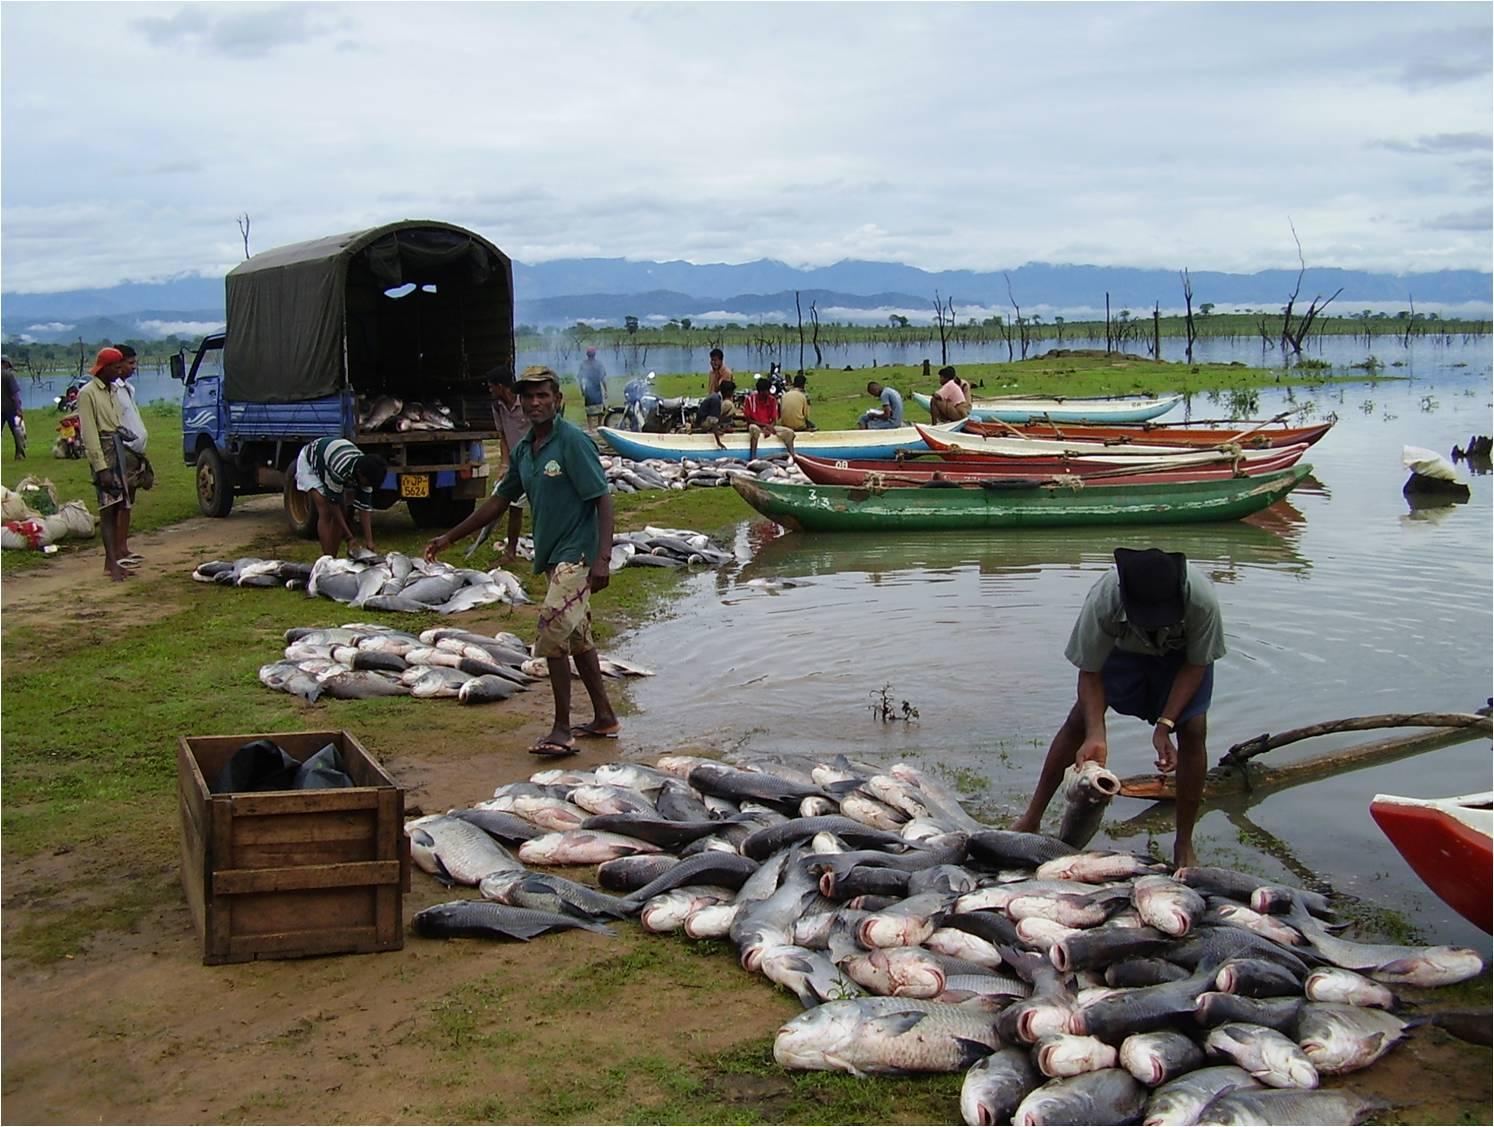 Domestic Fish Production Records 0.8% Rise